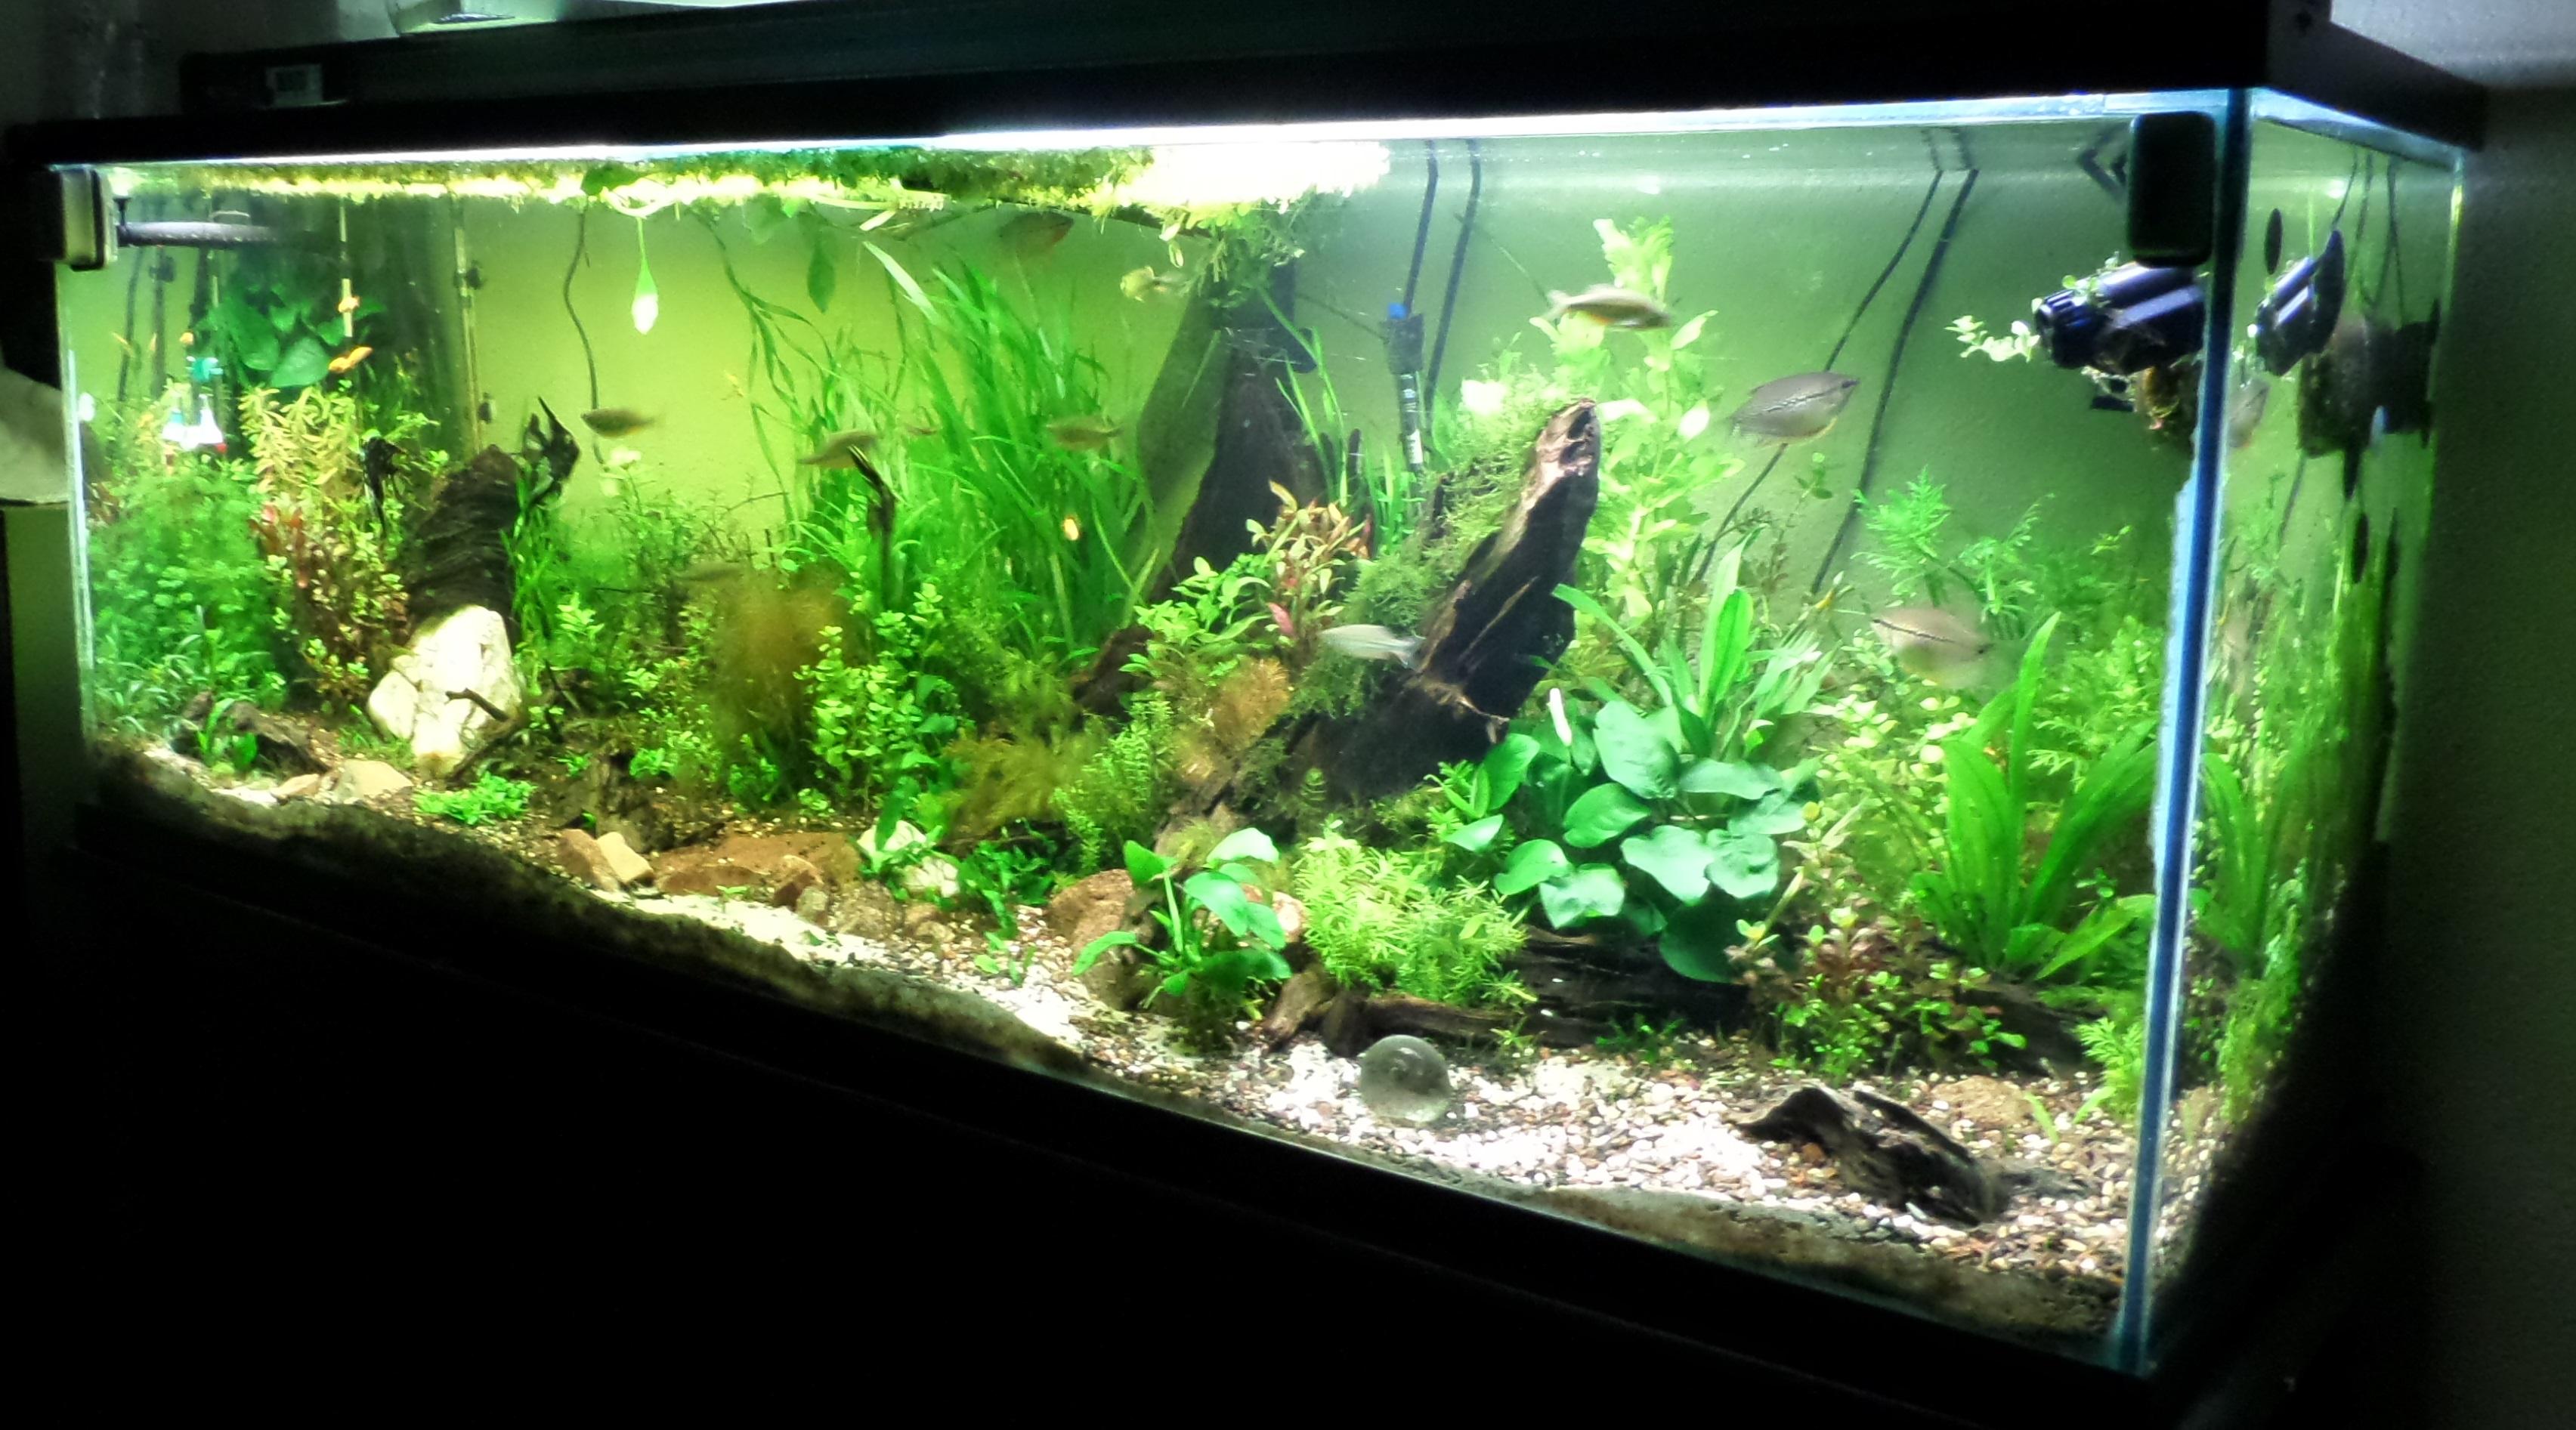 150 Gallon Aquarium : 150 Gallon - Community Tank My World of Planted Freshwater ...